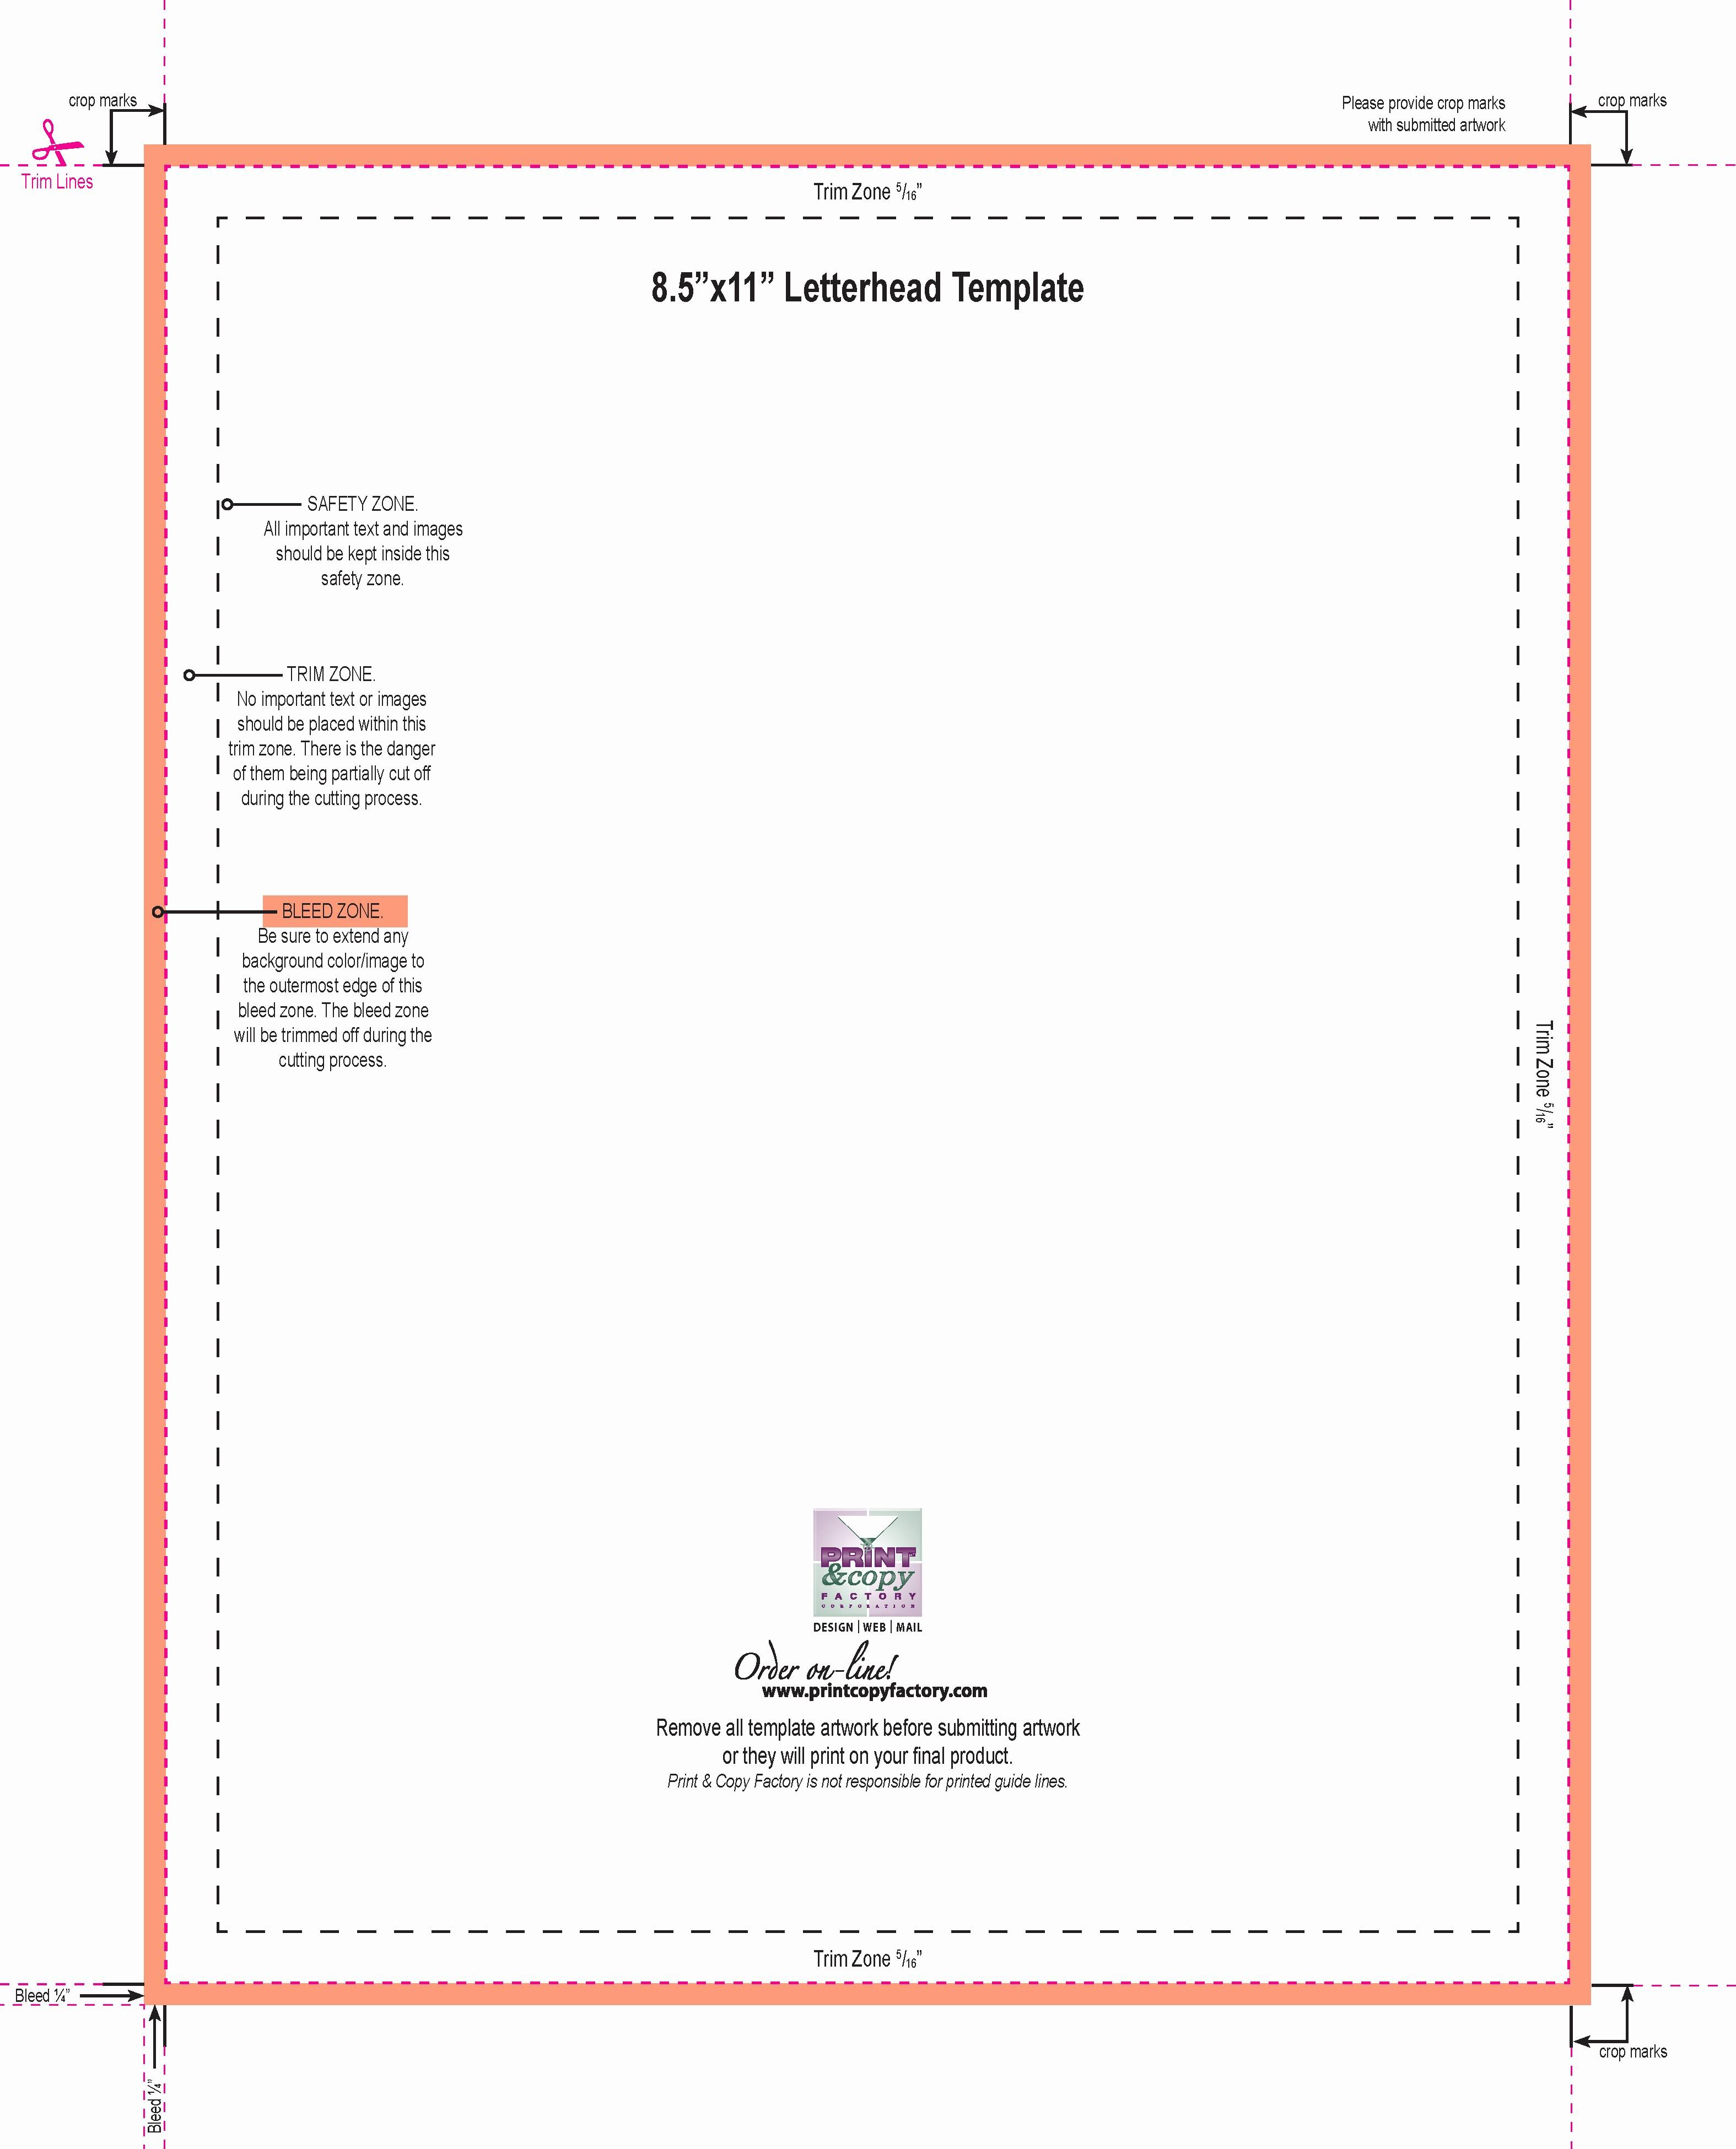 8.5 X 11 Recipe Template Best Of Design Templates Print & Copy Factory